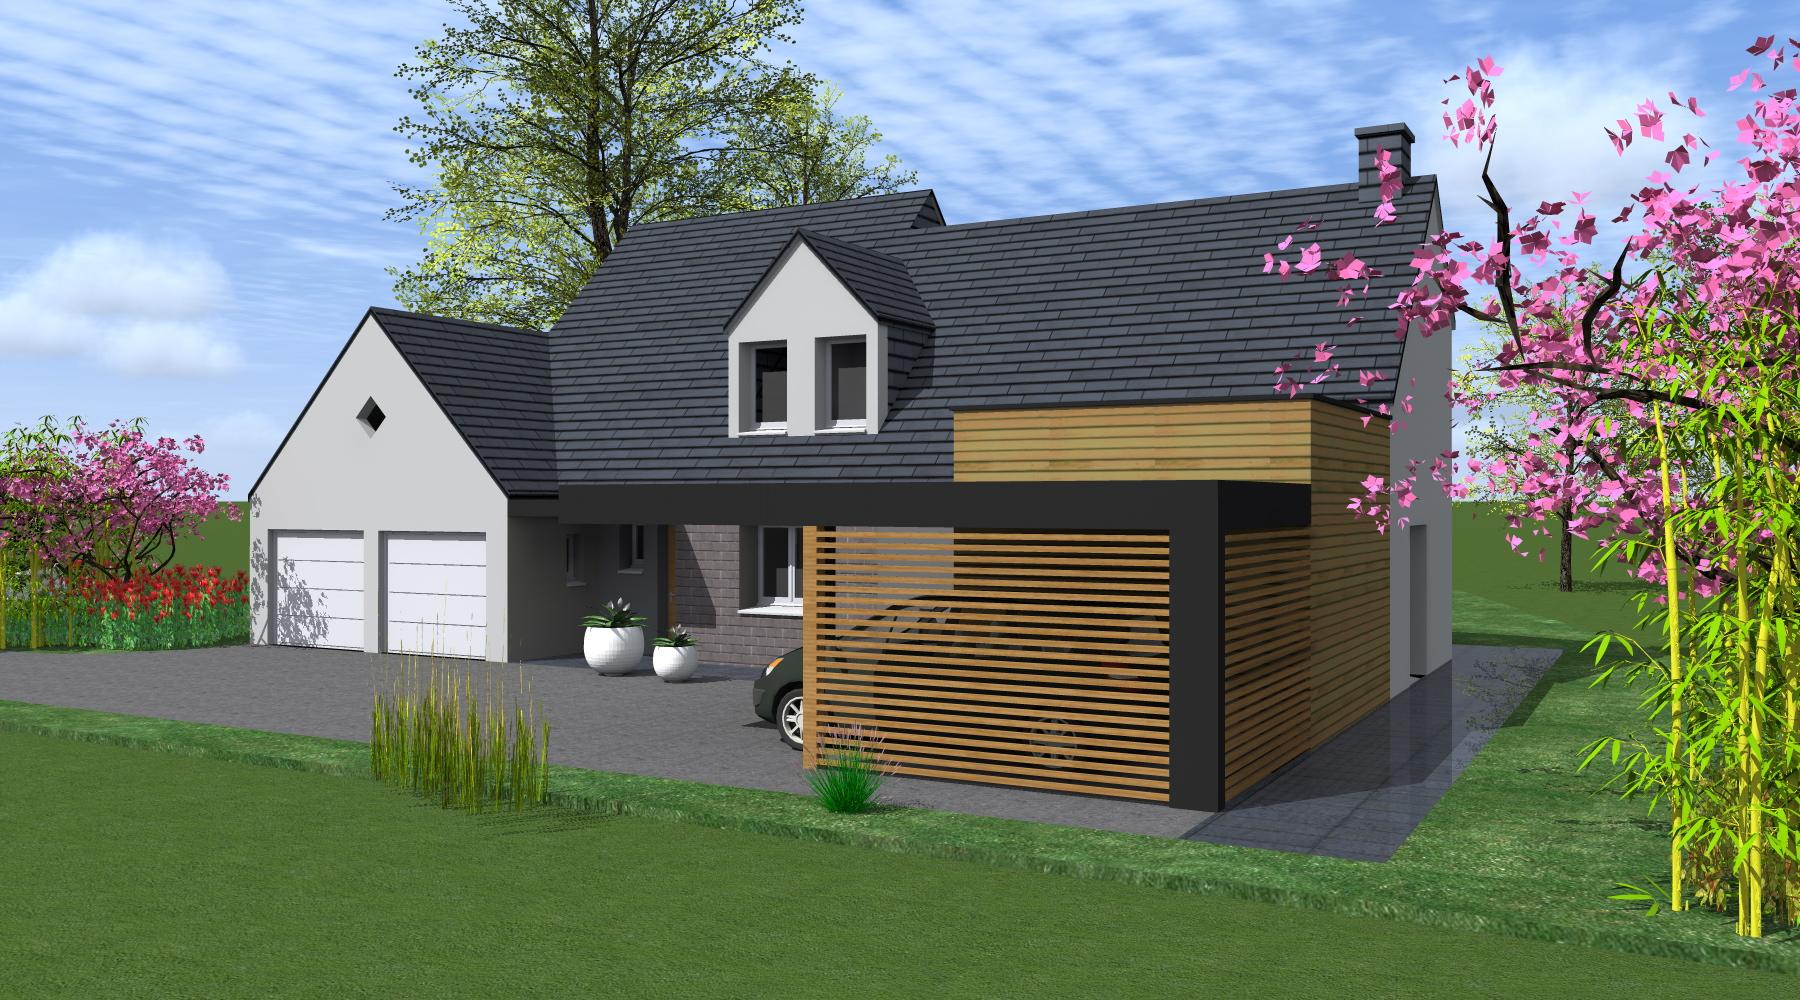 Projet g 1 2 vue architecte lise roturier rennes for Extension maison tva